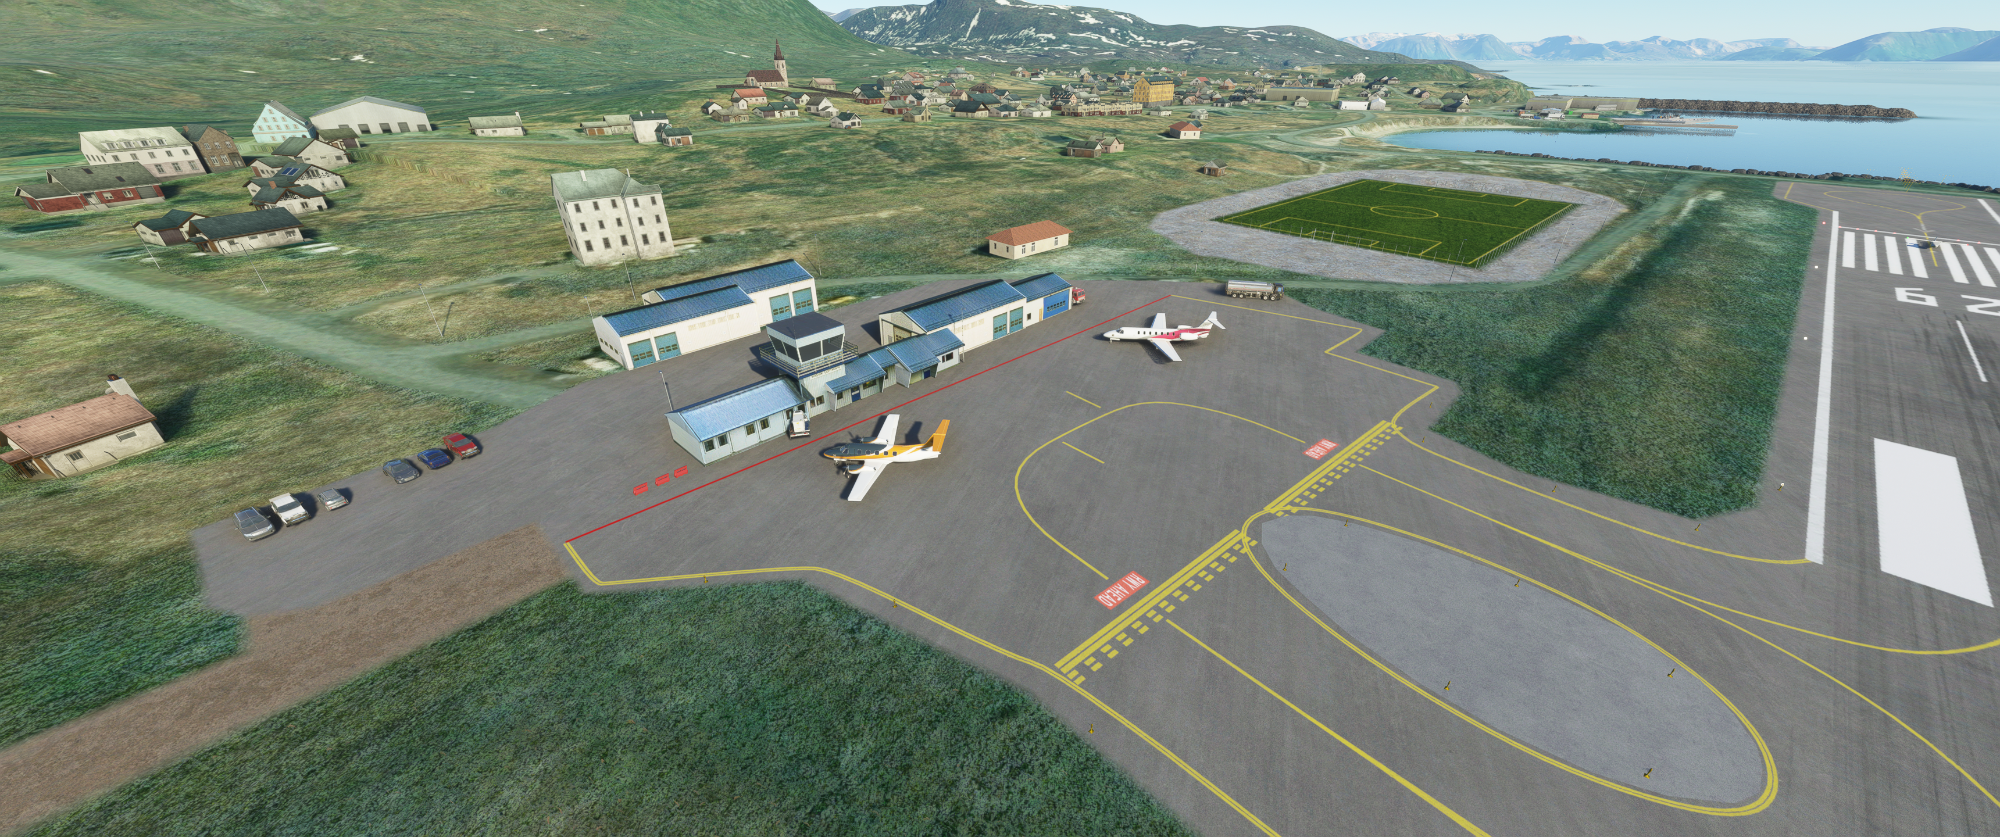 Microsoft Flight Simulator Screenshot 2020.11.24 - 14.23.16.31.png